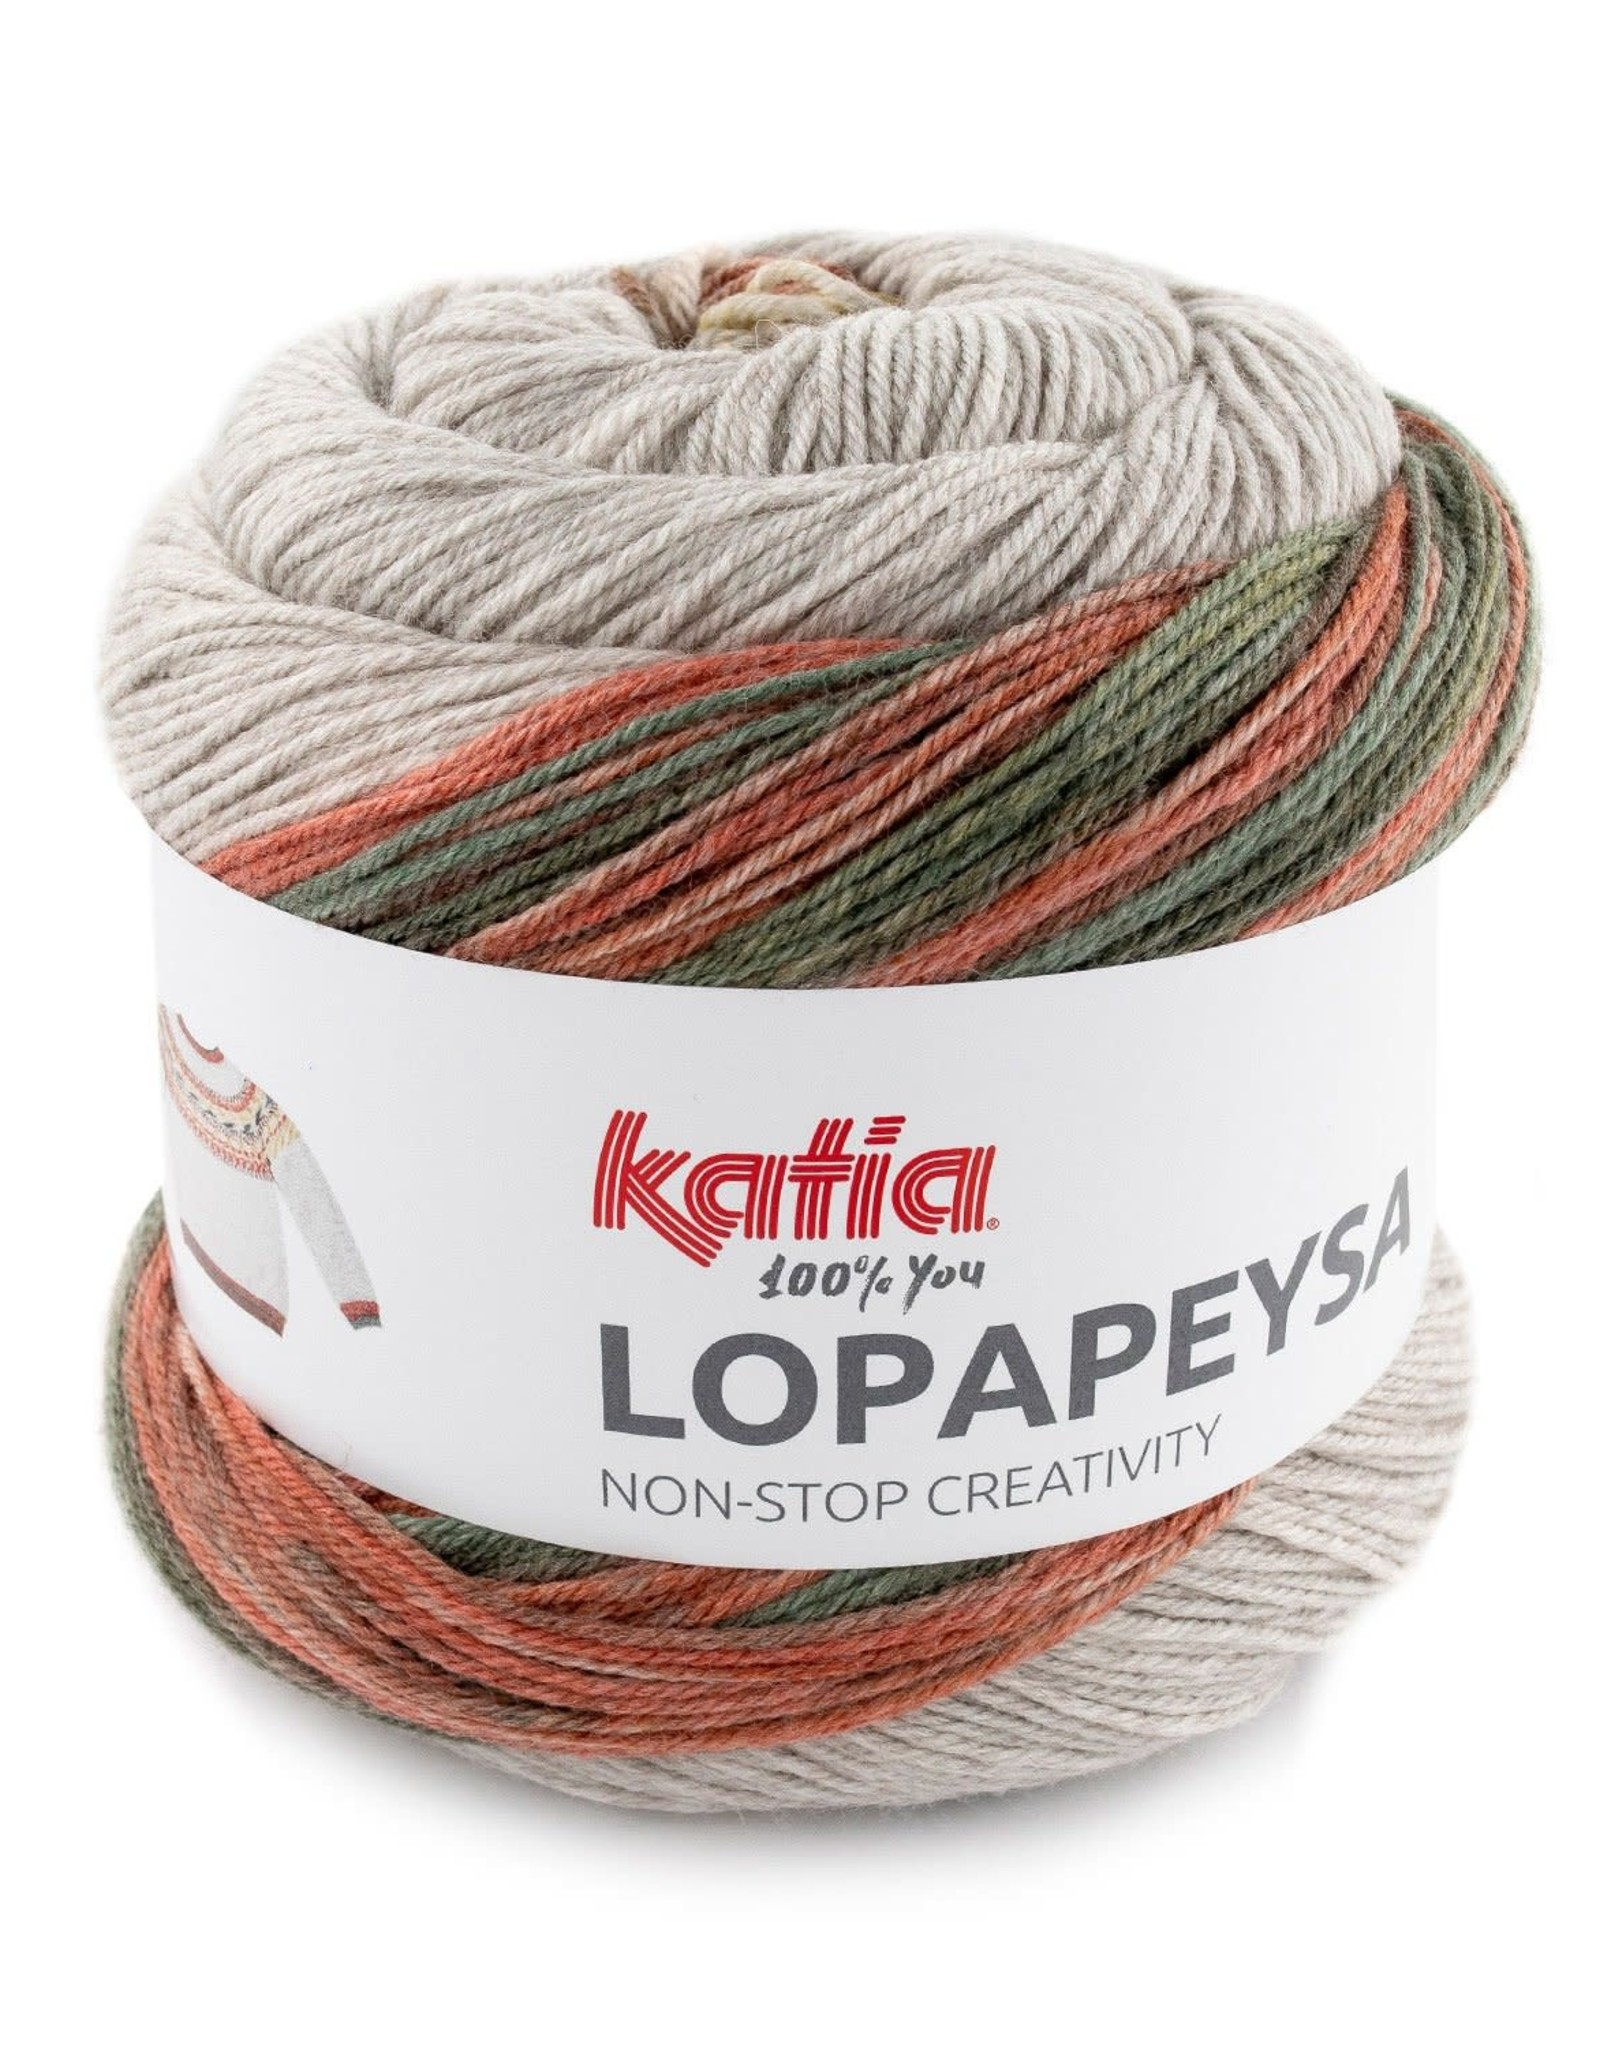 Katia Katia Lopapeysa  101 - Roestbruin-Geelgroen-Groen